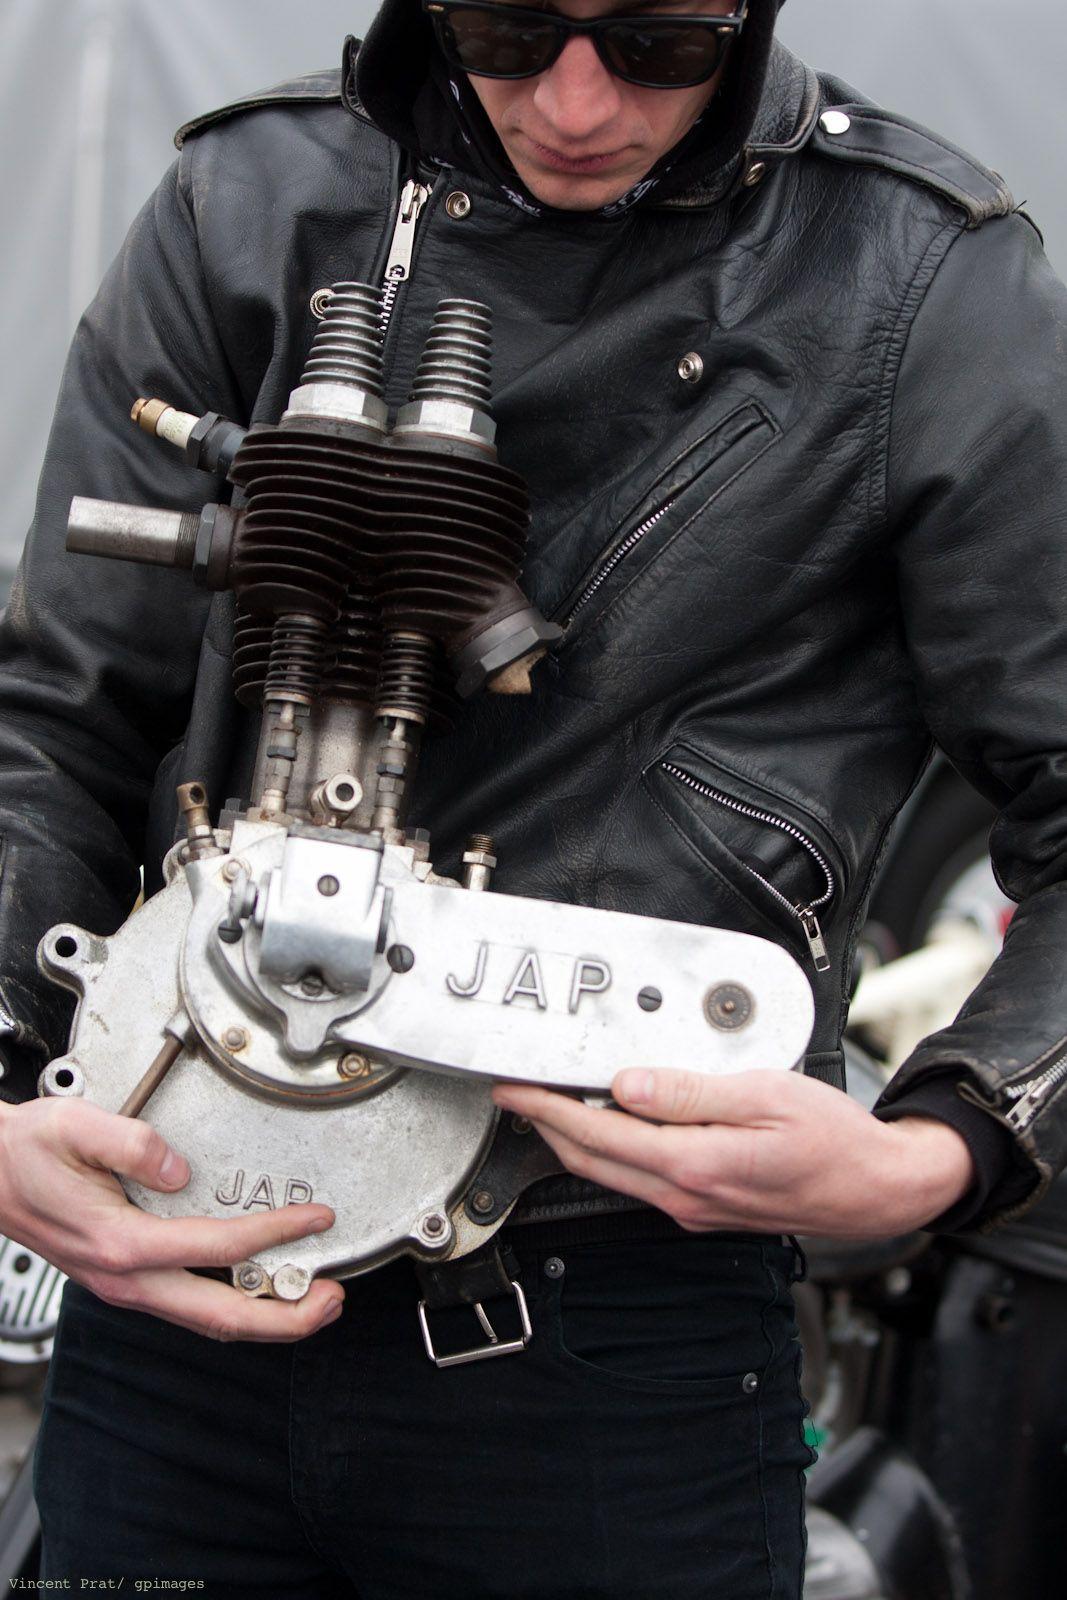 """O"" and the Jap engine - MAr 2012 http://southsiders-mc.tumblr.com/"